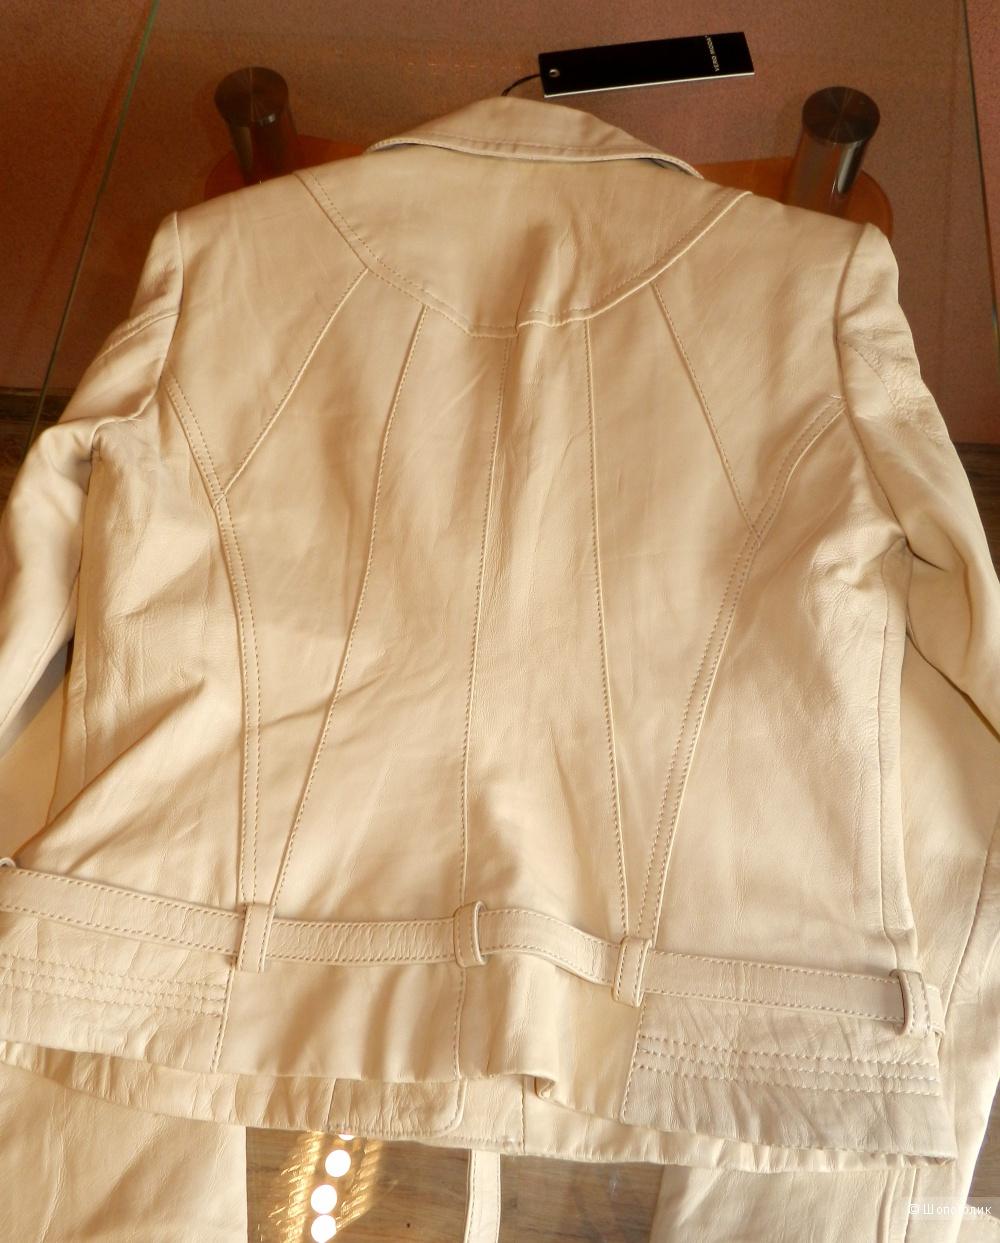 Кожаная куртка VERO MODA 46-50